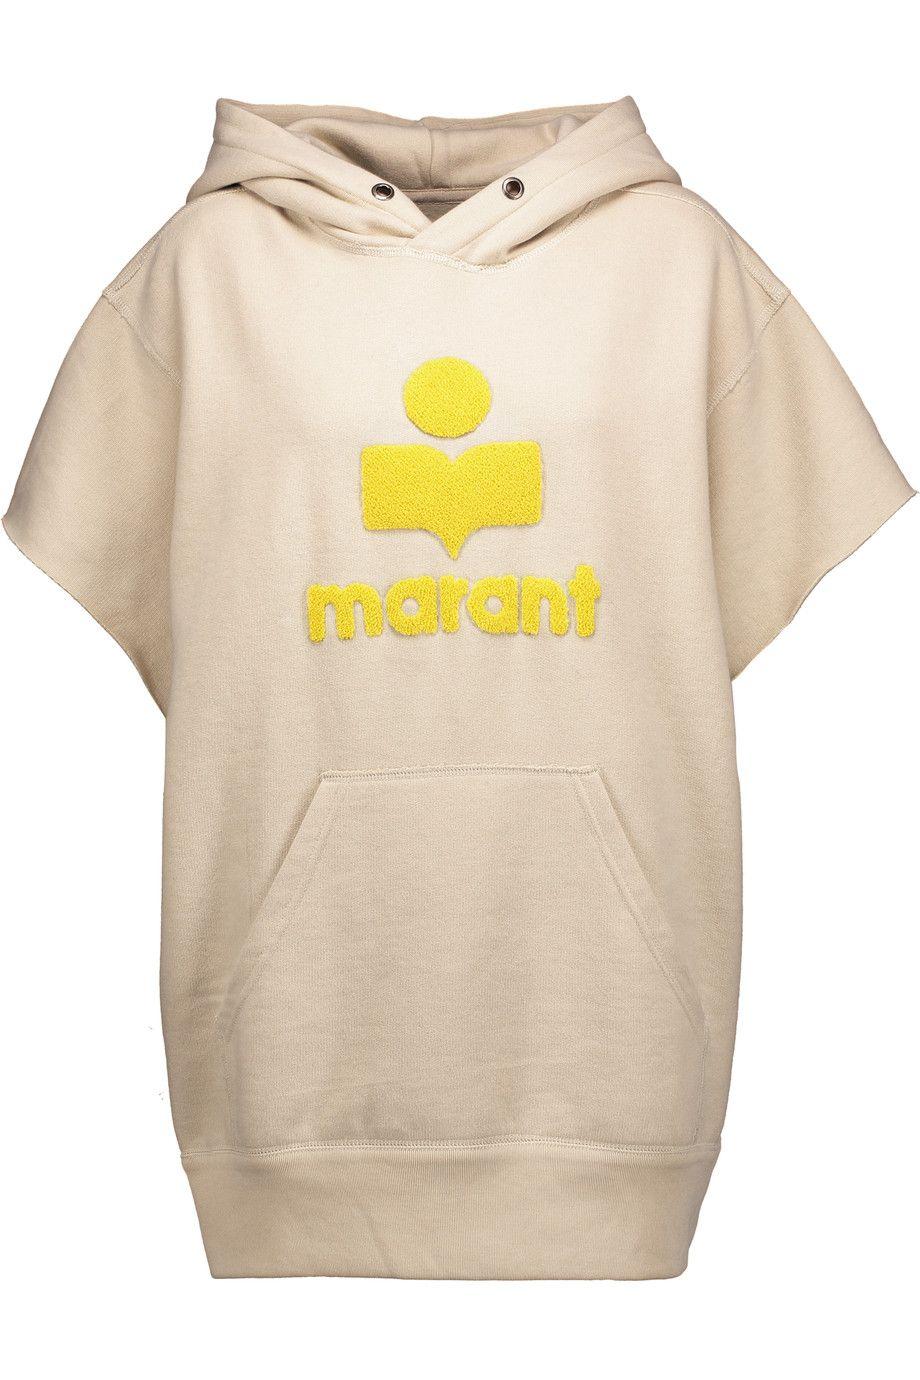 ETOILE ISABEL MARANT Carlo Terry-Embroidered Cotton-Blend Hooded Sweatshirt. #etoileisabelmarant #cloth #sweatshirt